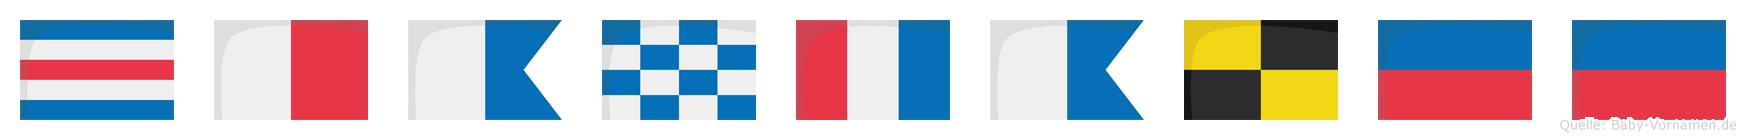 Chantalee im Flaggenalphabet